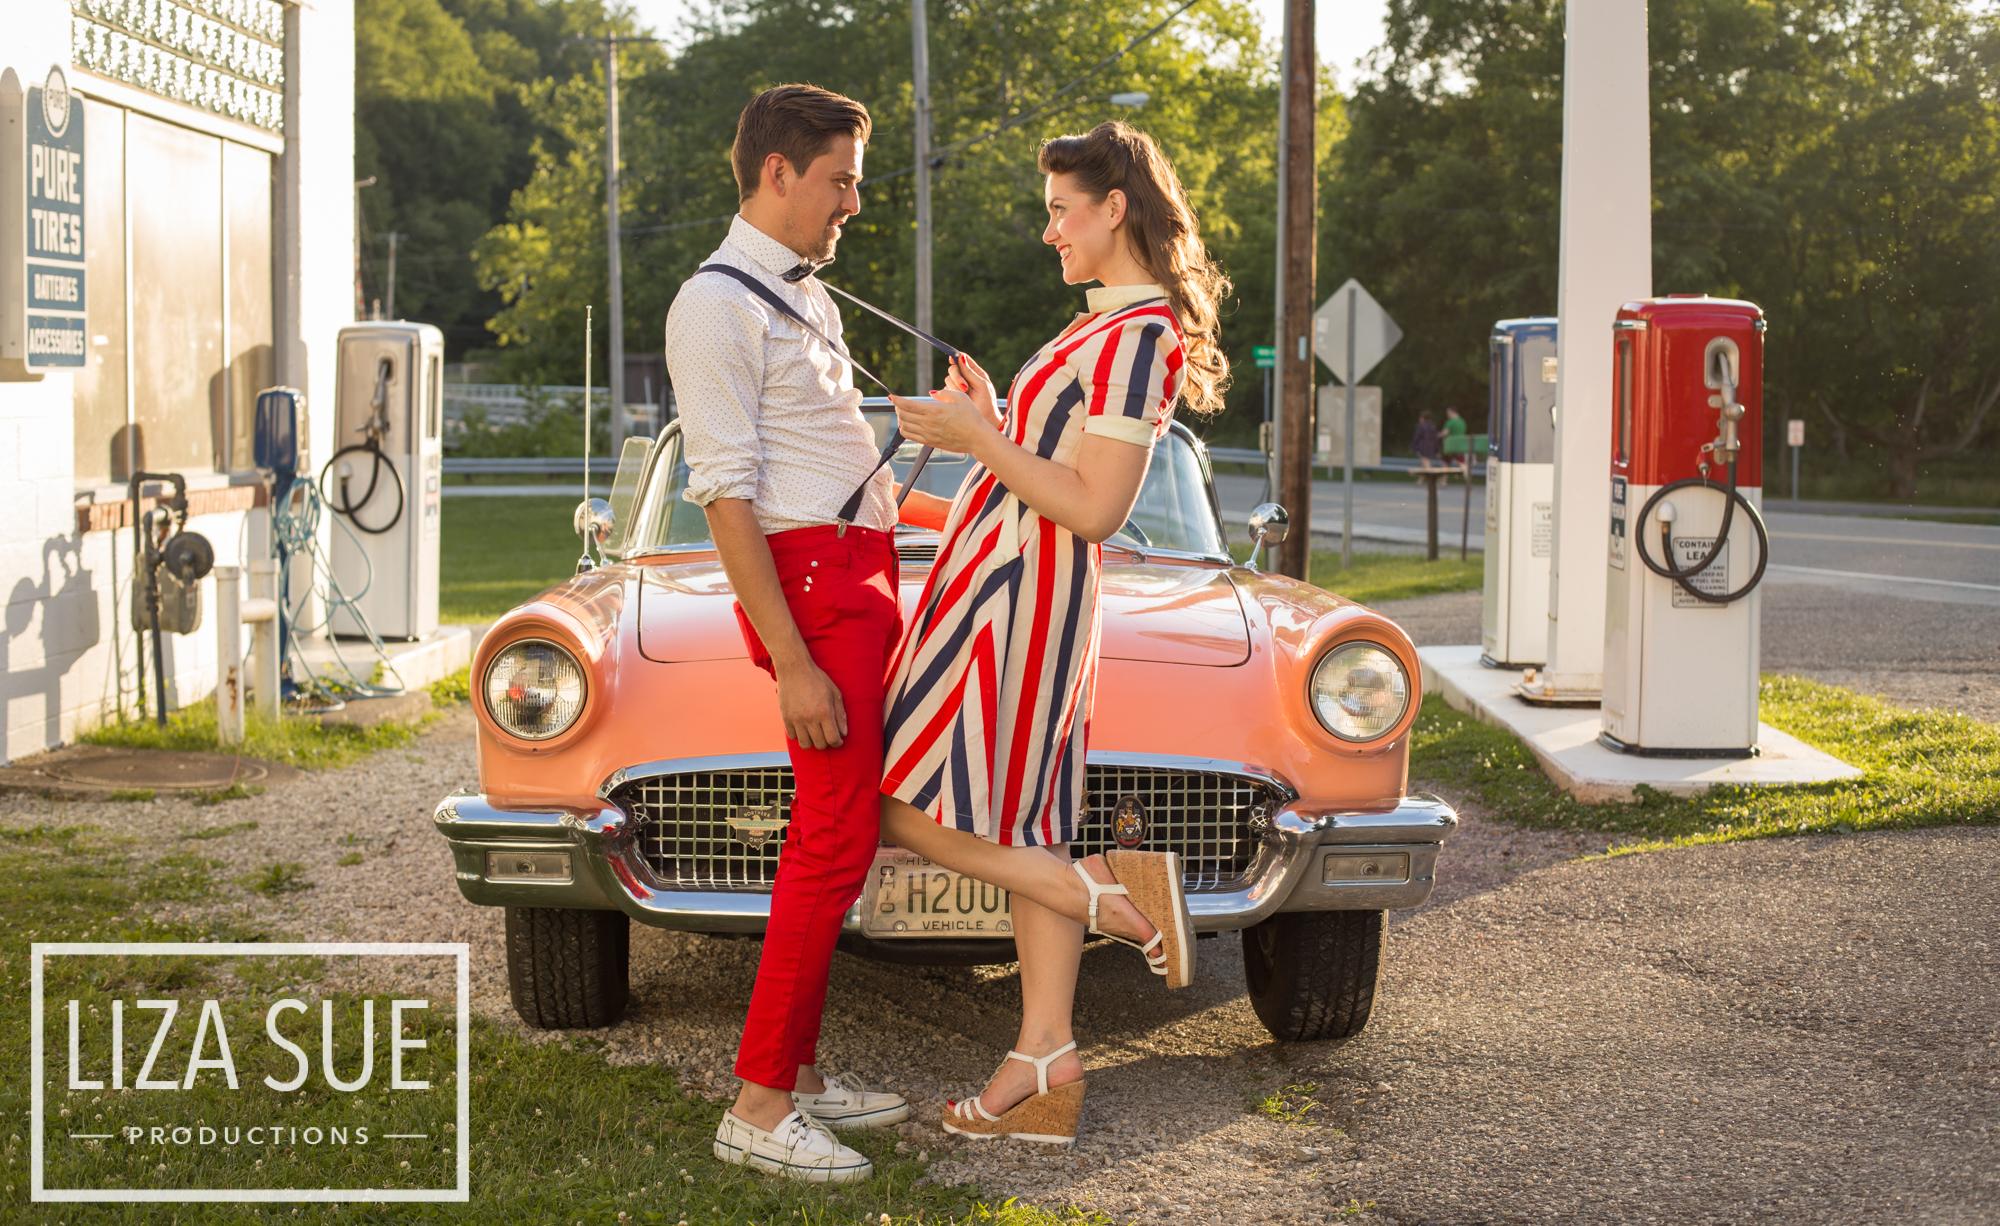 cleveland + akron vintage family photoshoot retro car 1950s engagement session